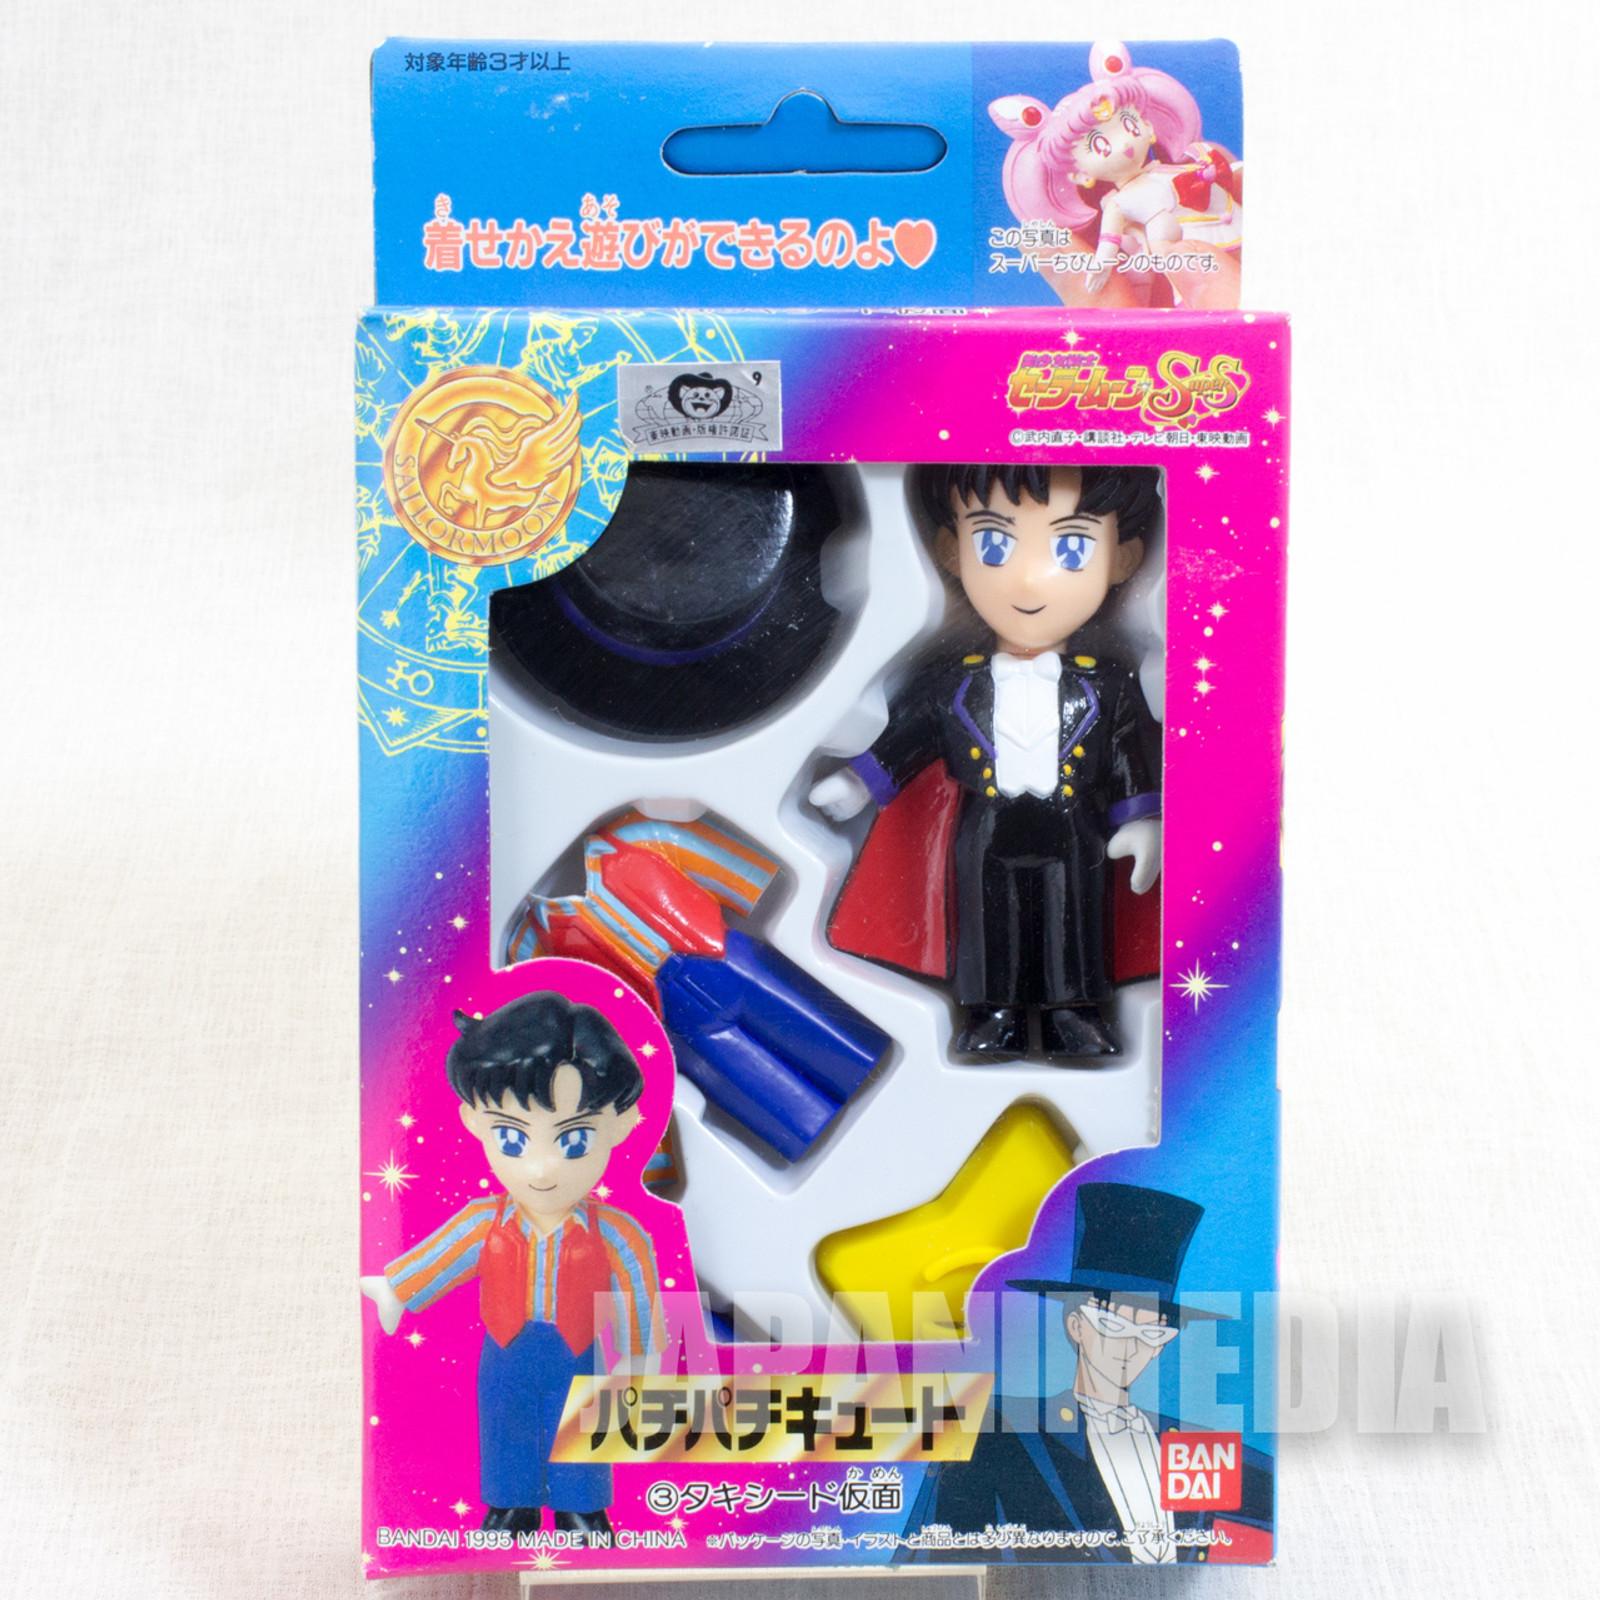 Retro RARE Sailor Moon Tuxedo Mask (Mamoru Chiba) PachiPachi Cute Figure BANDAI